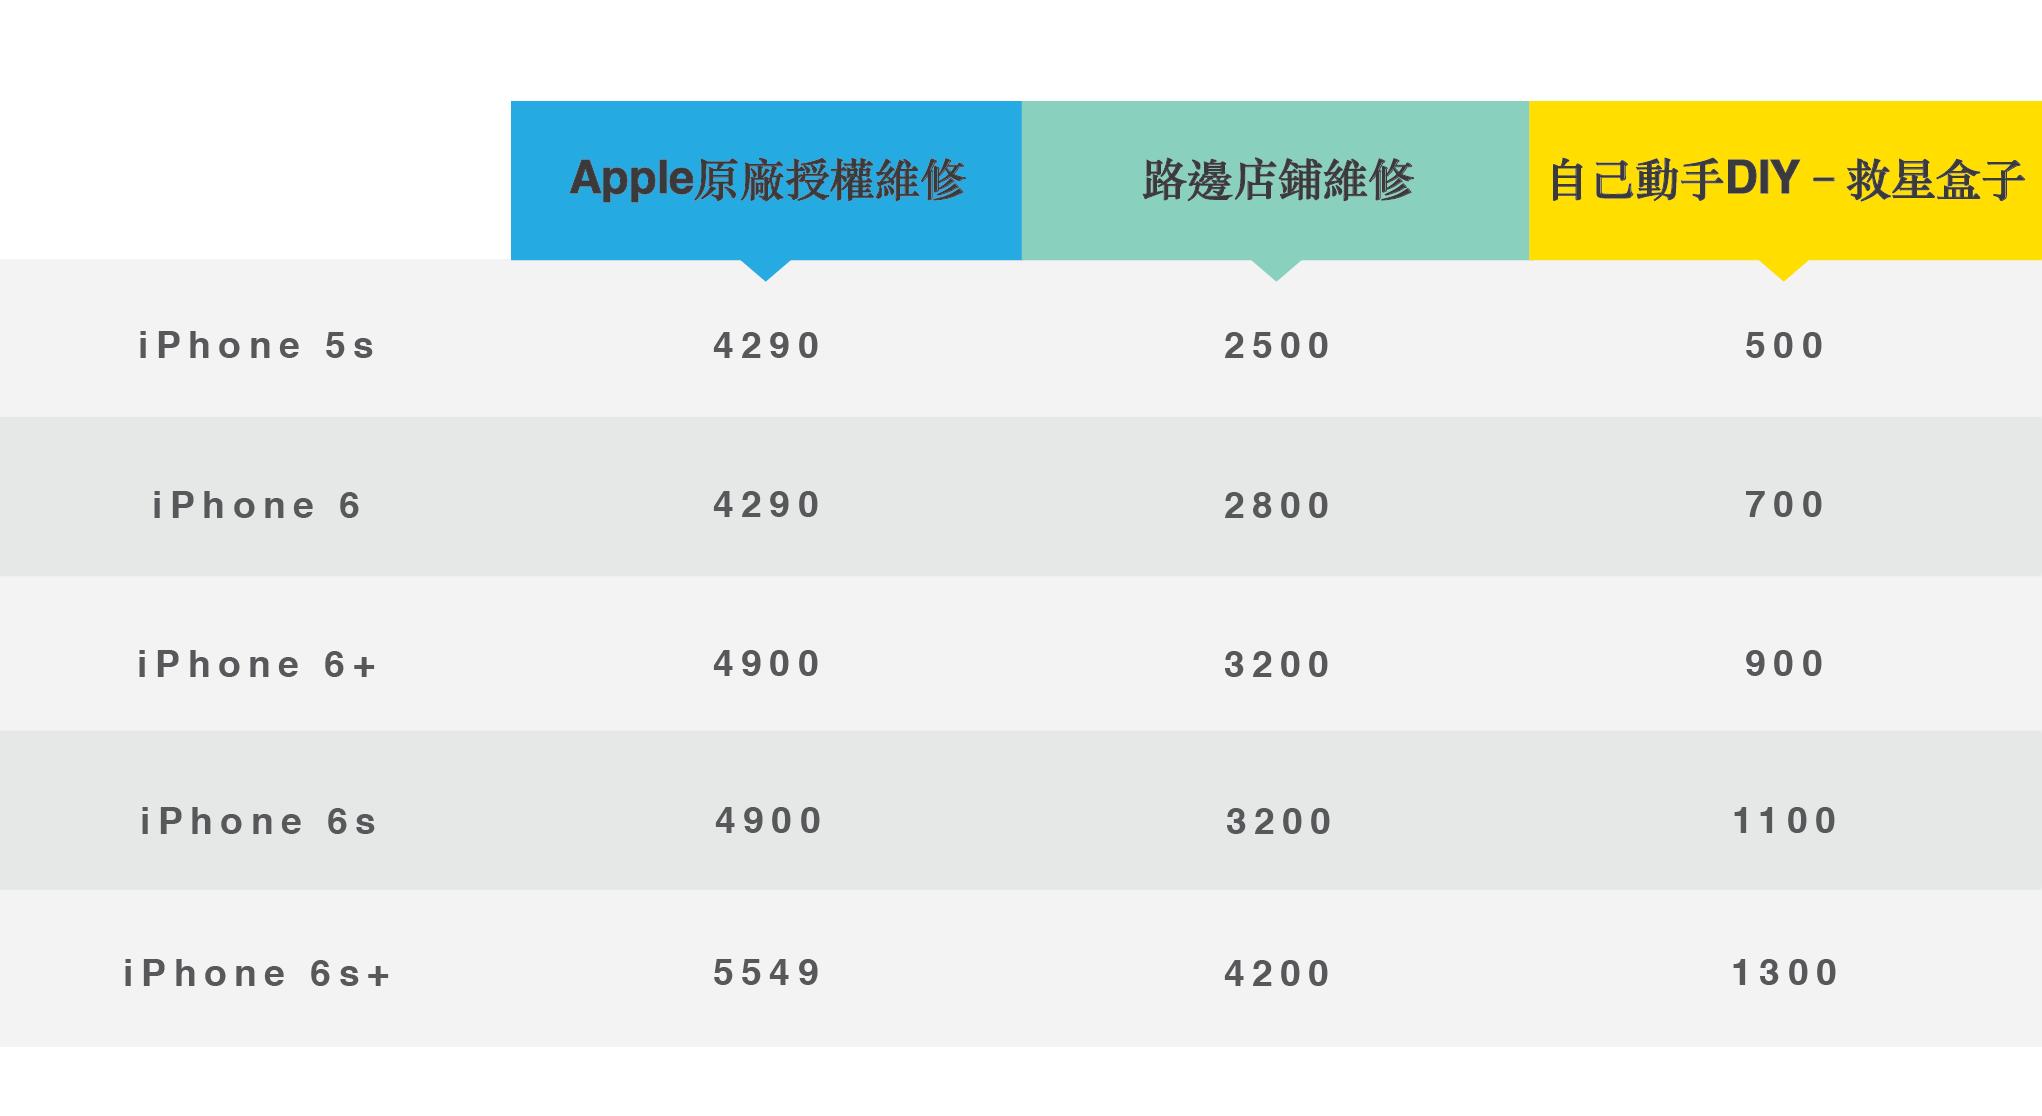 iphone-screen-repair-Pricing-comparison